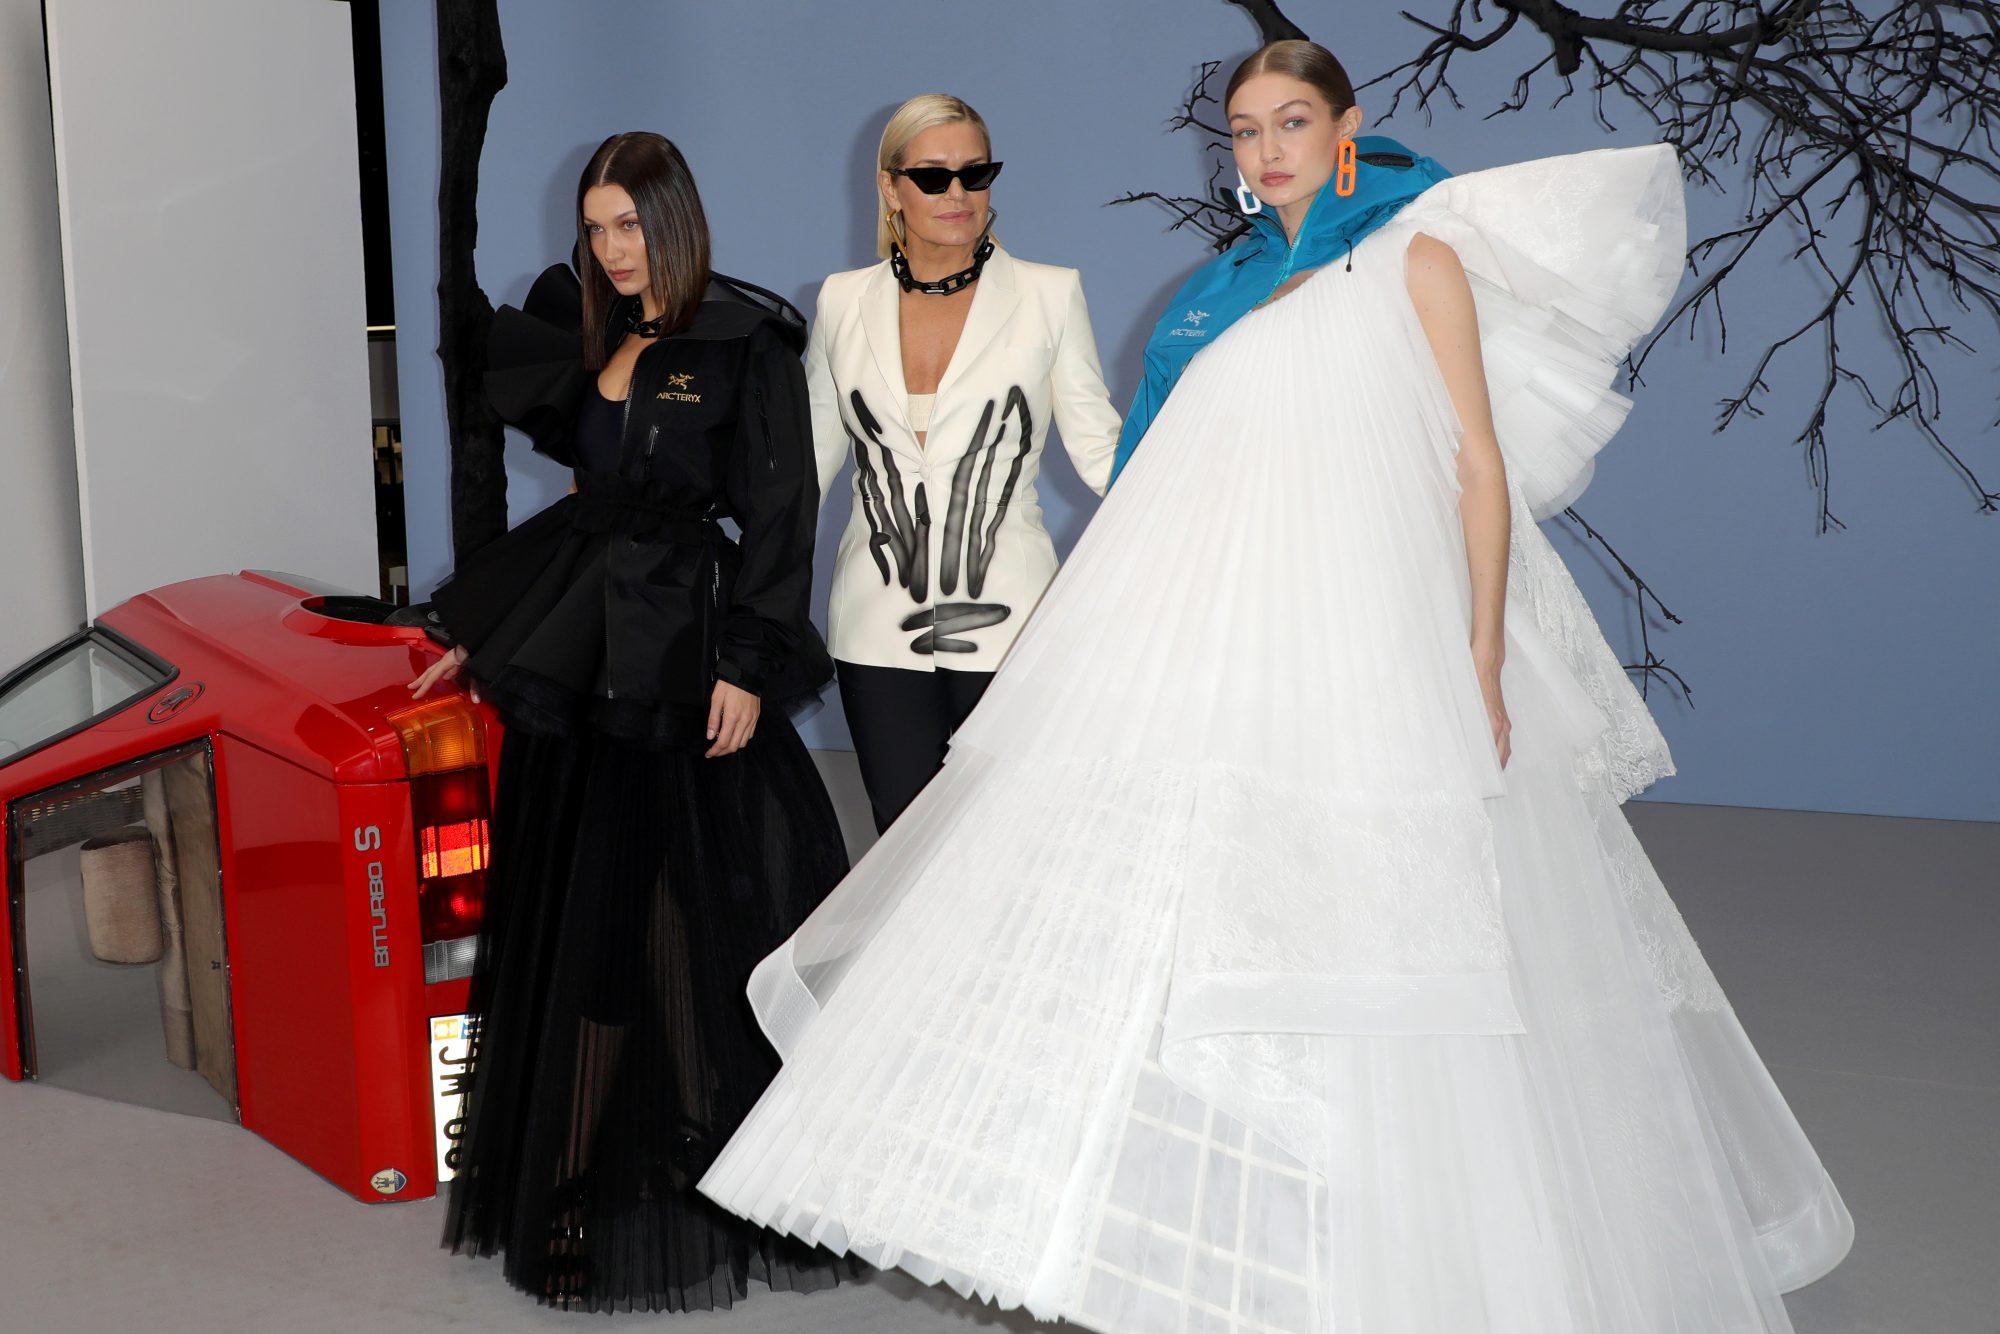 Gigi Hadid, Bella Hadid, Yolana Hadid, Paris, semana de la moda